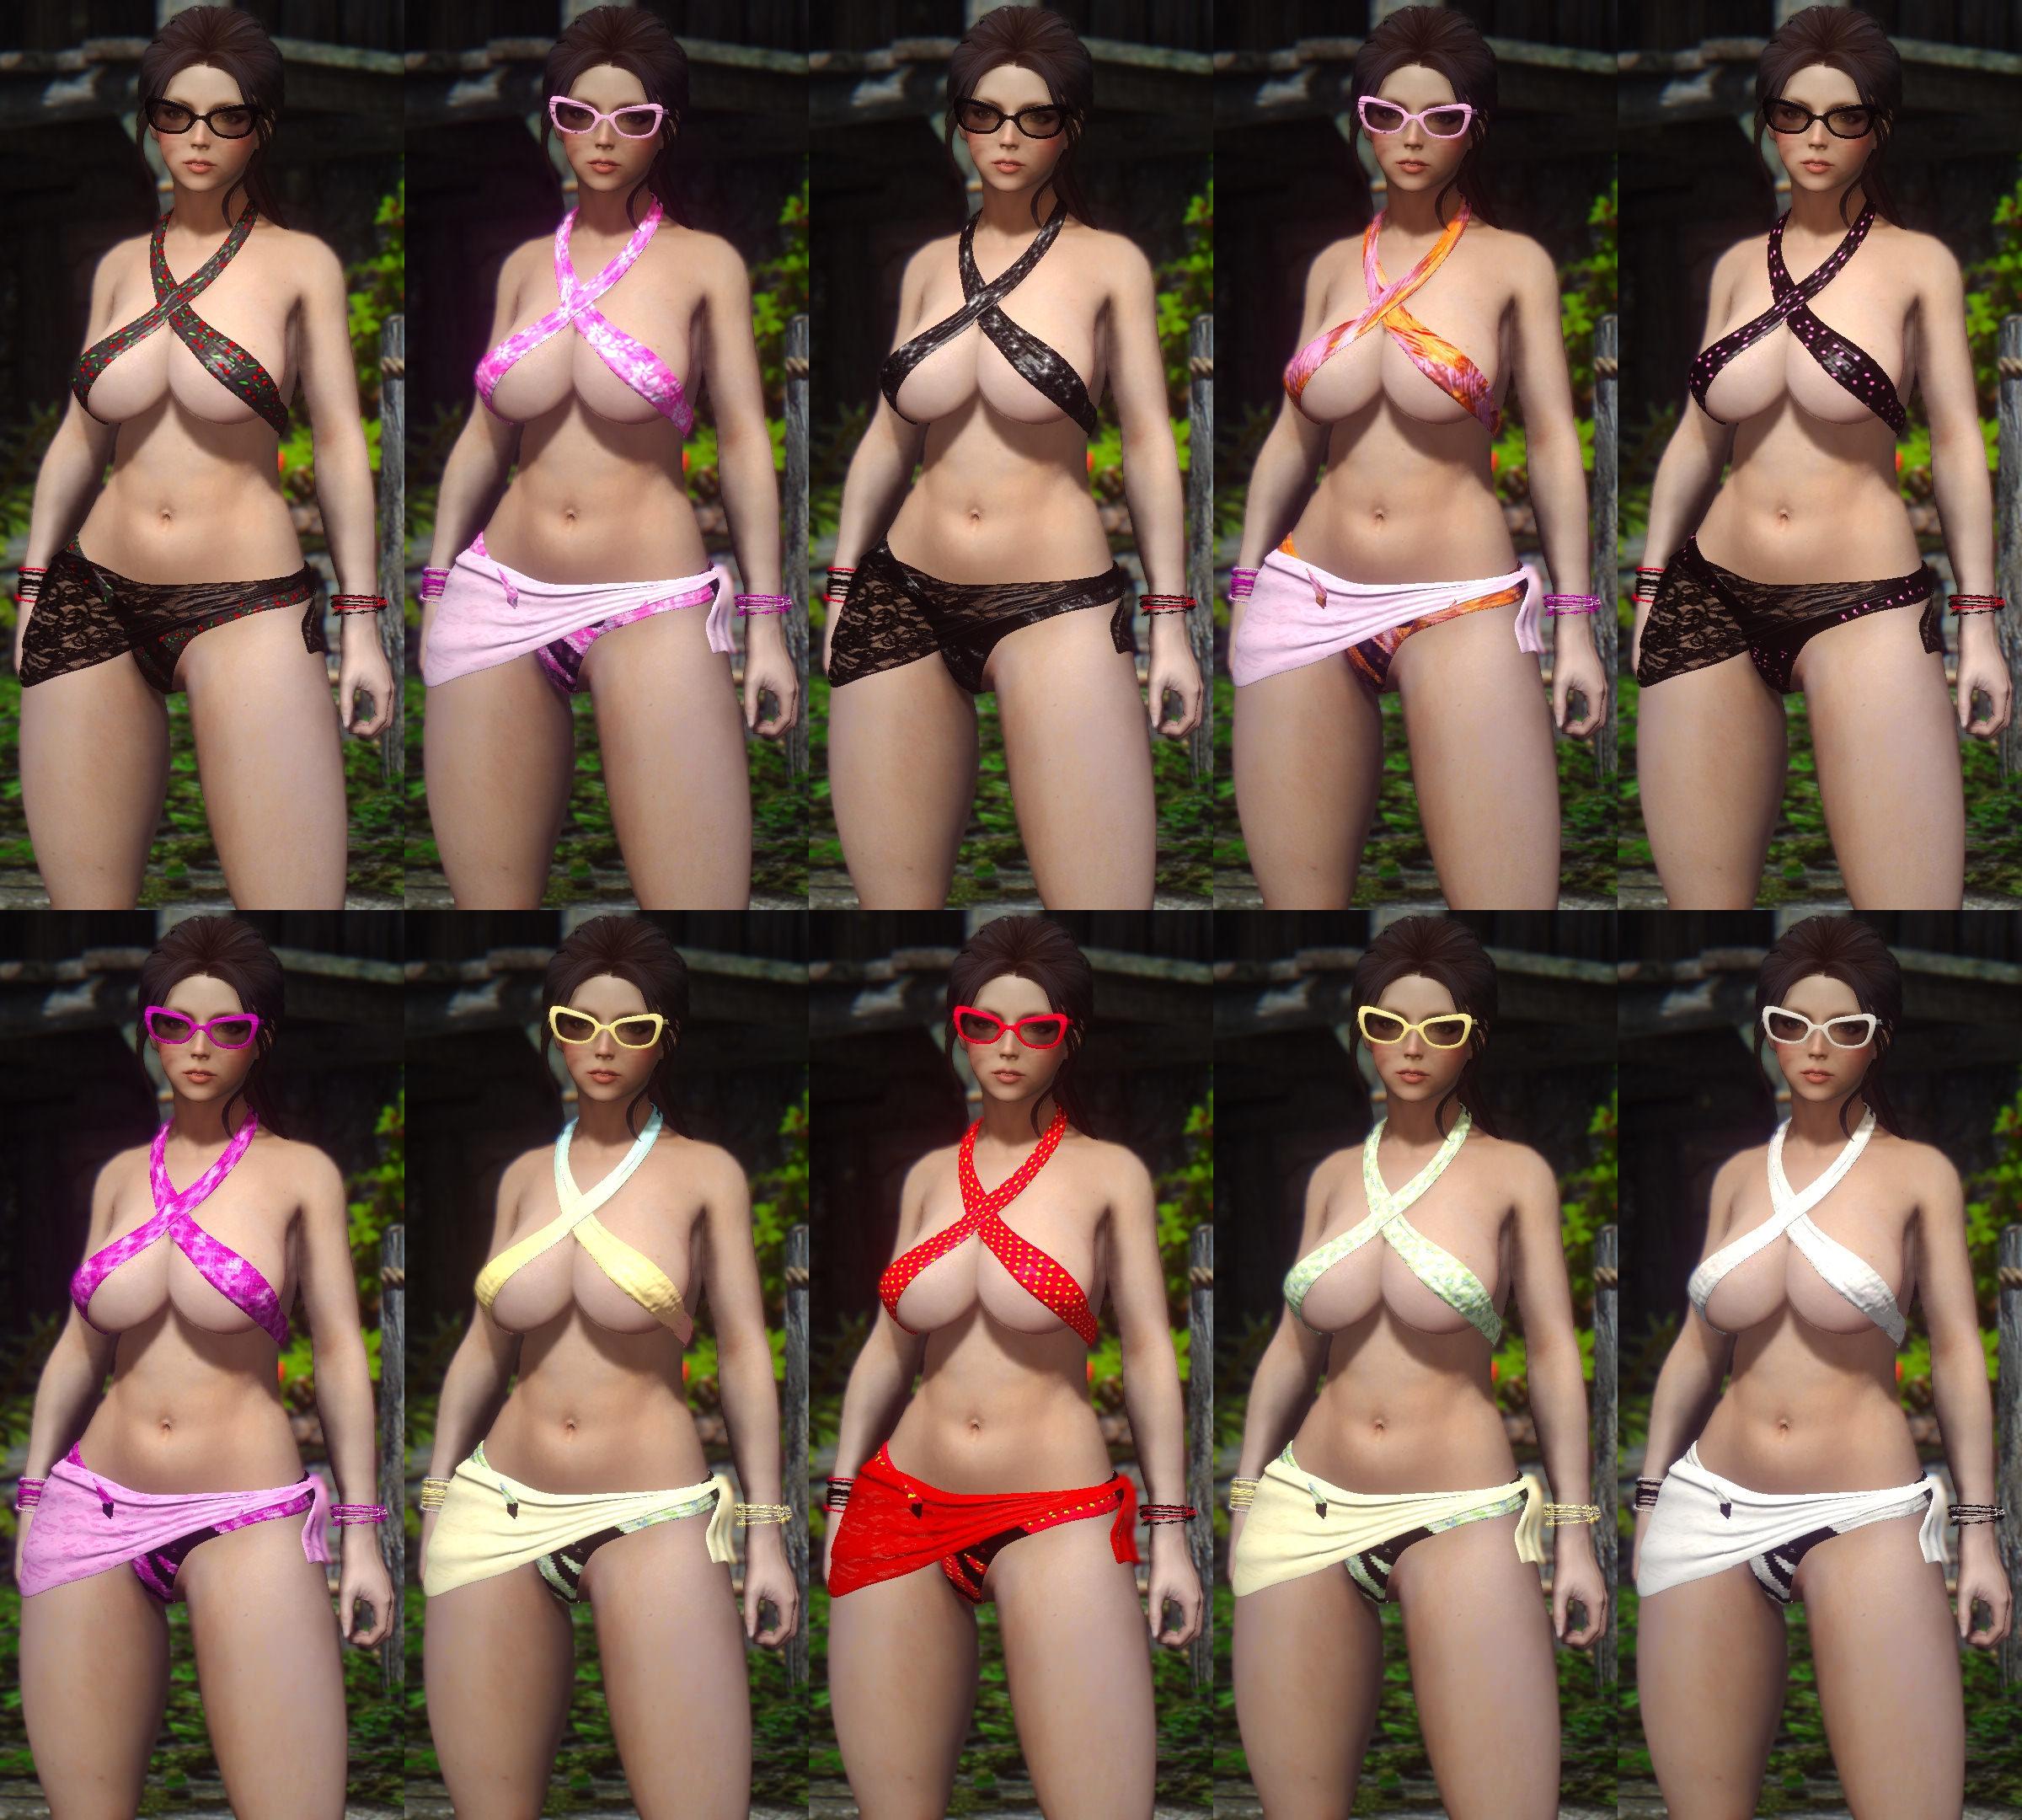 Daz_Bikini_Collection_2_7BO_4.jpg